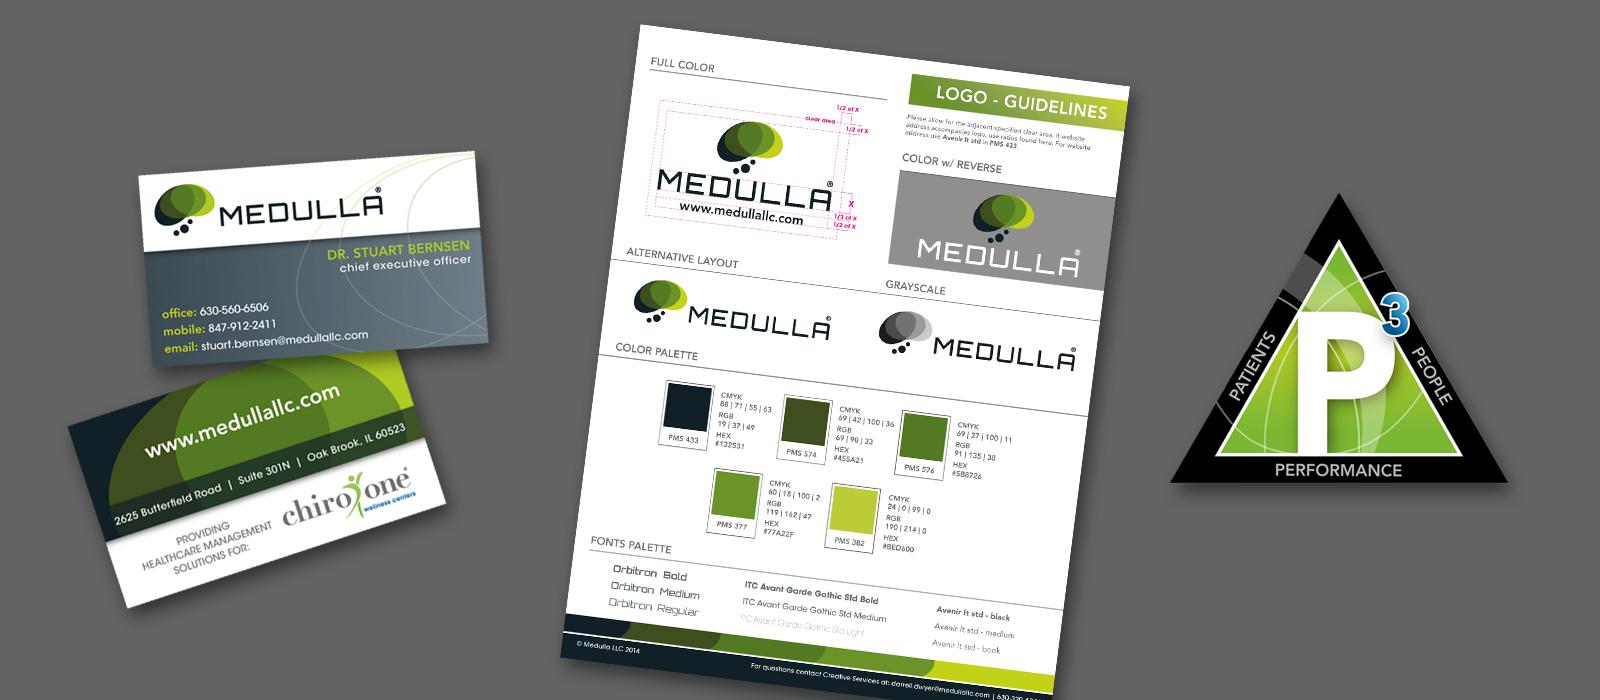 Medulla Branding Guidelines